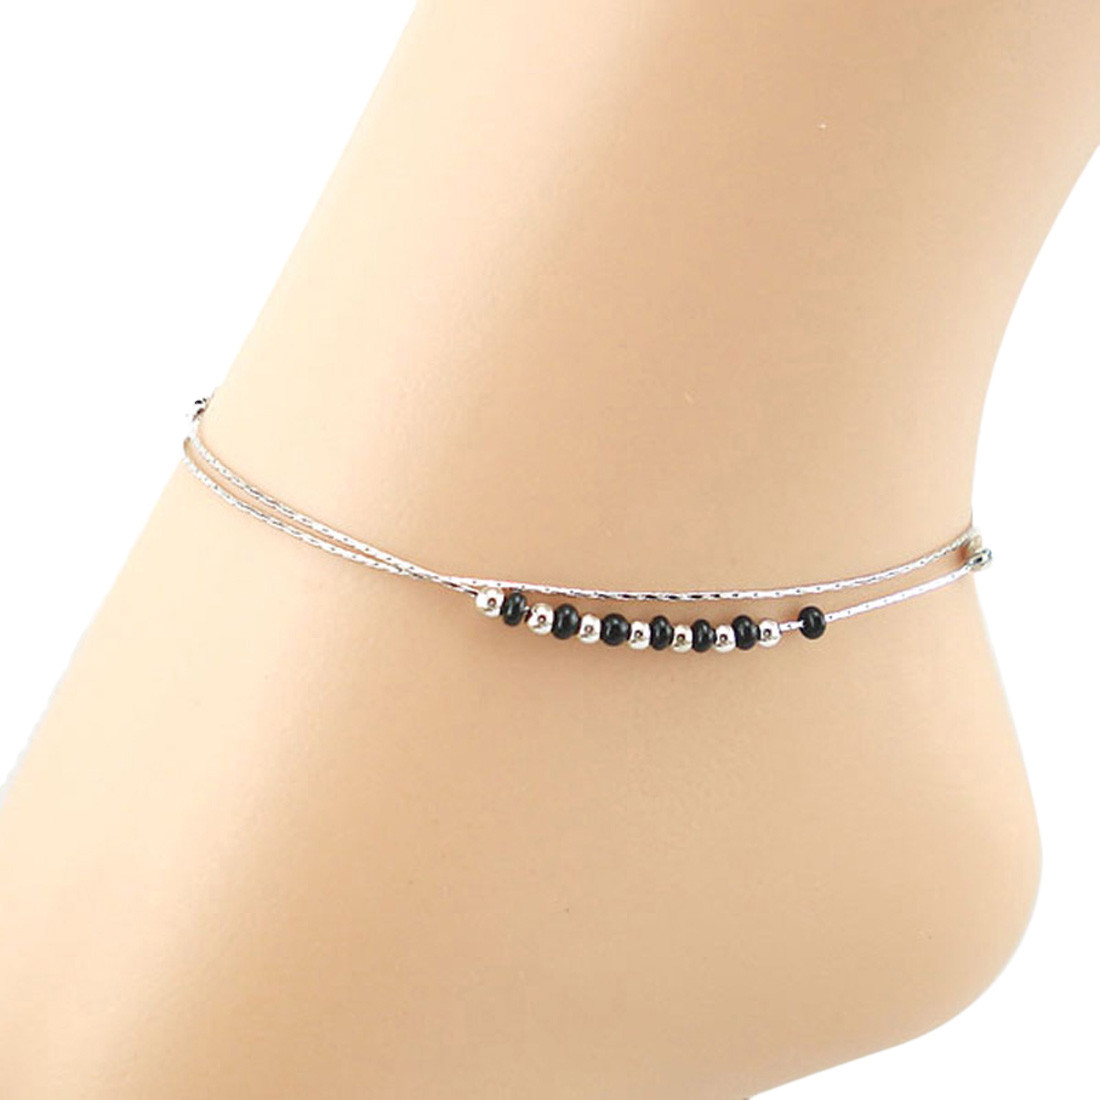 Women Silver Plated Anklet Chain Bracelet Barefoot Sandal Beach Foot Jewelry Zn